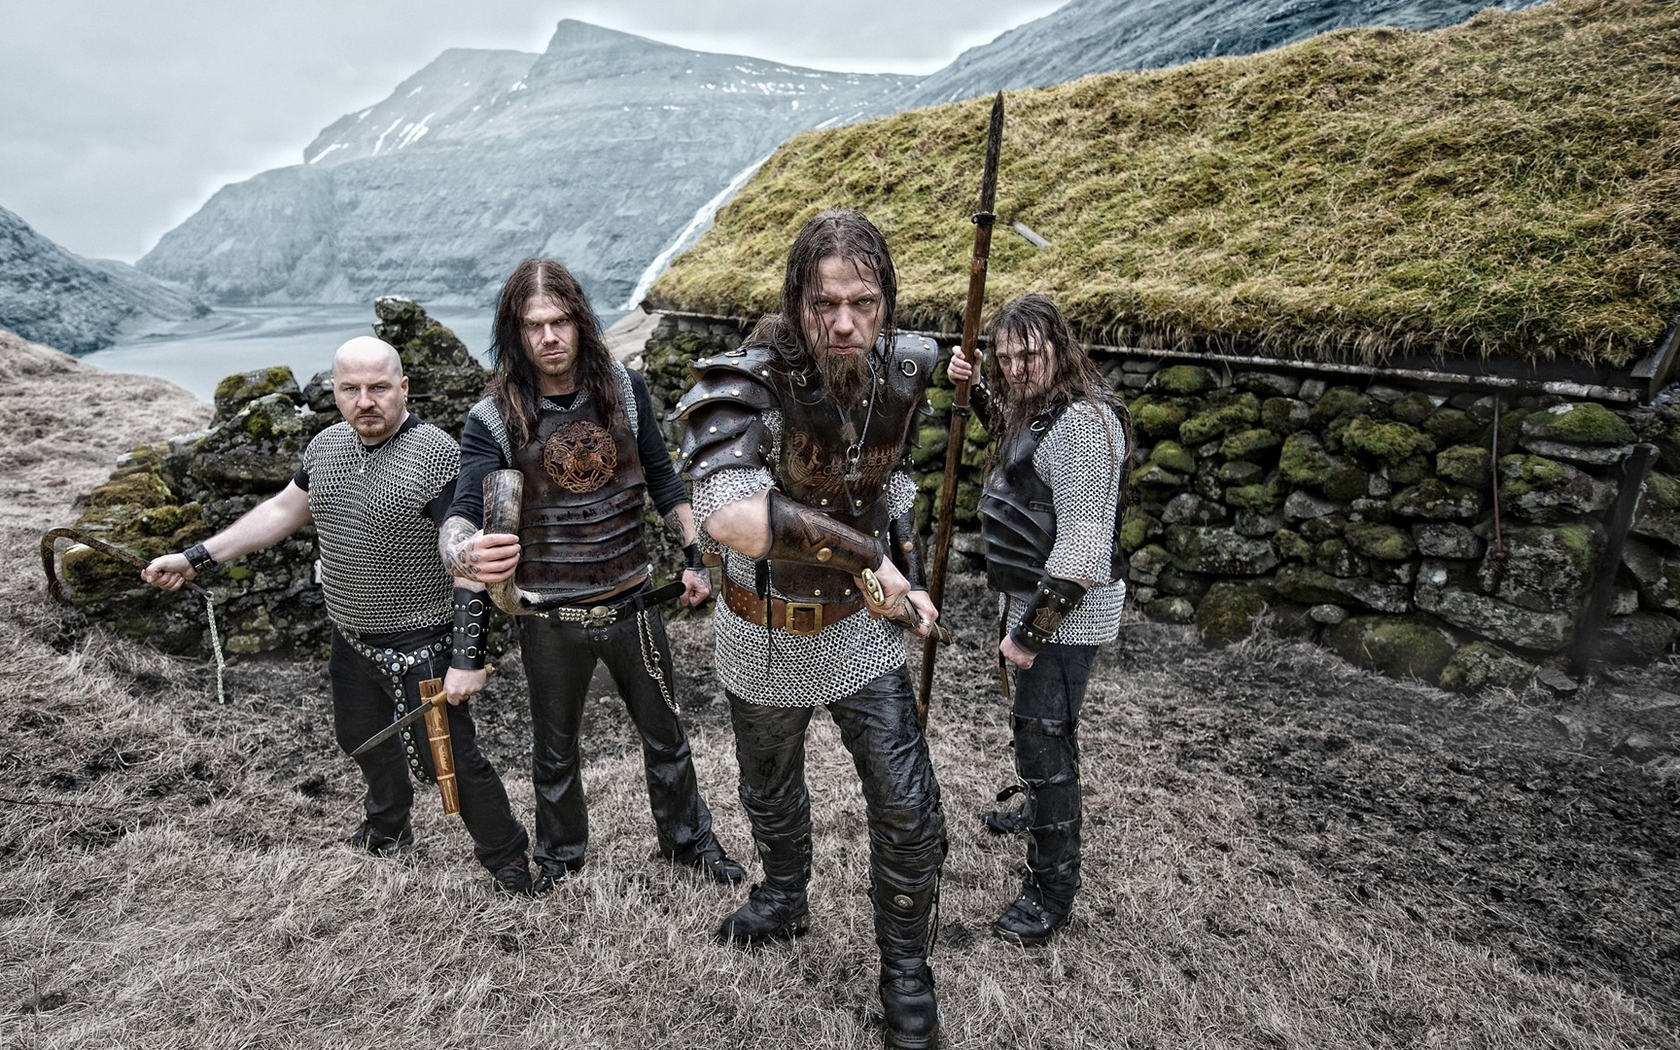 Download wallpaper 1680x1050 tyr warriors band mountains bald 1680x1050